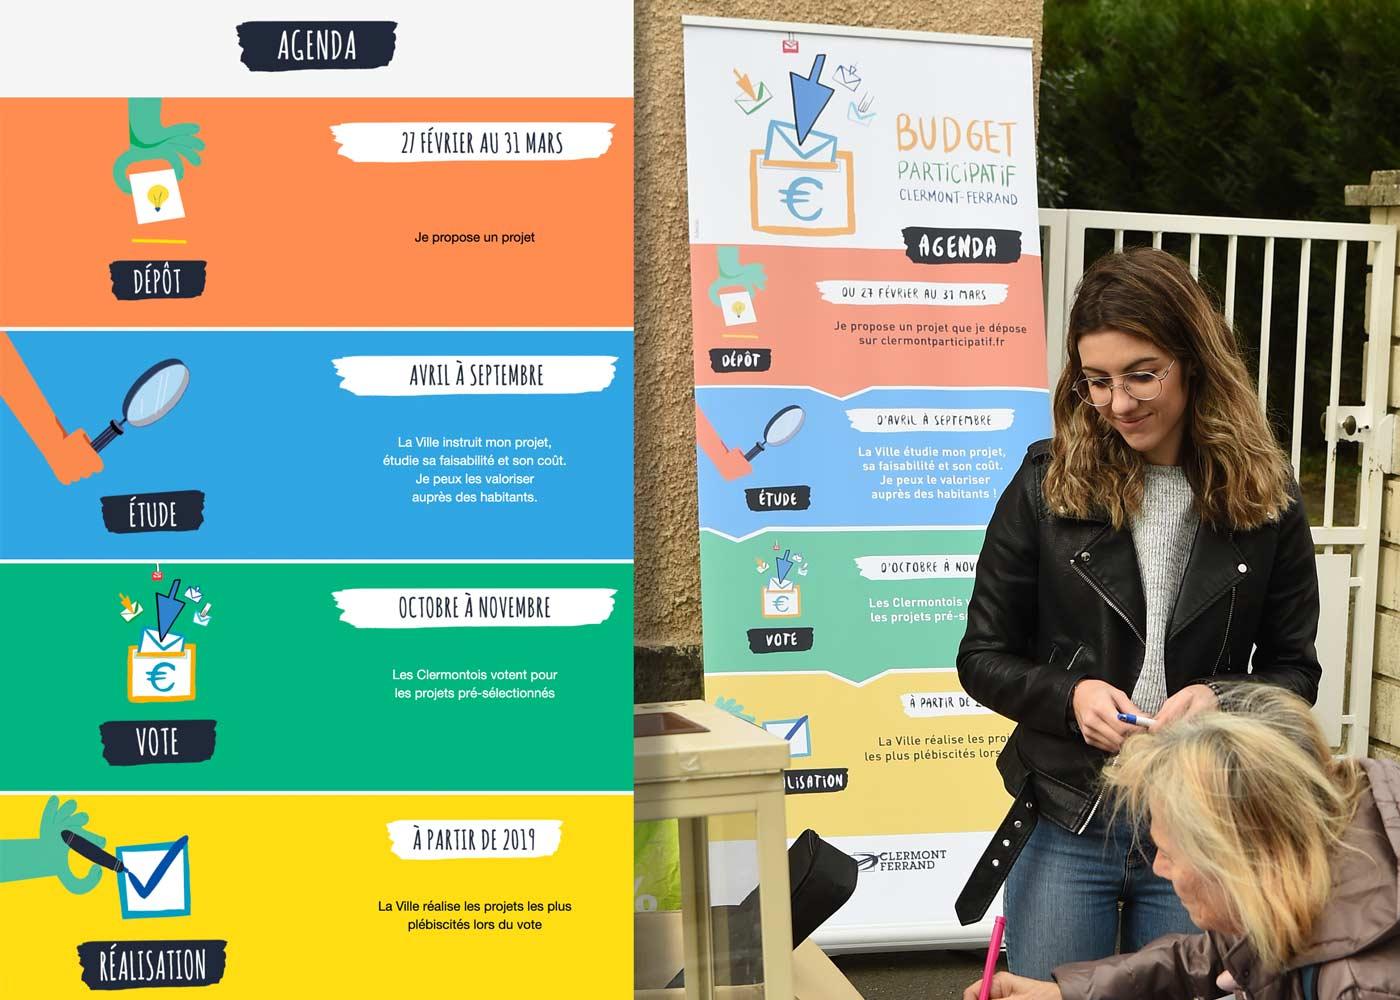 adesias-etude-de-cas-brand-campagne-notoriete-clermont-ferrand-10